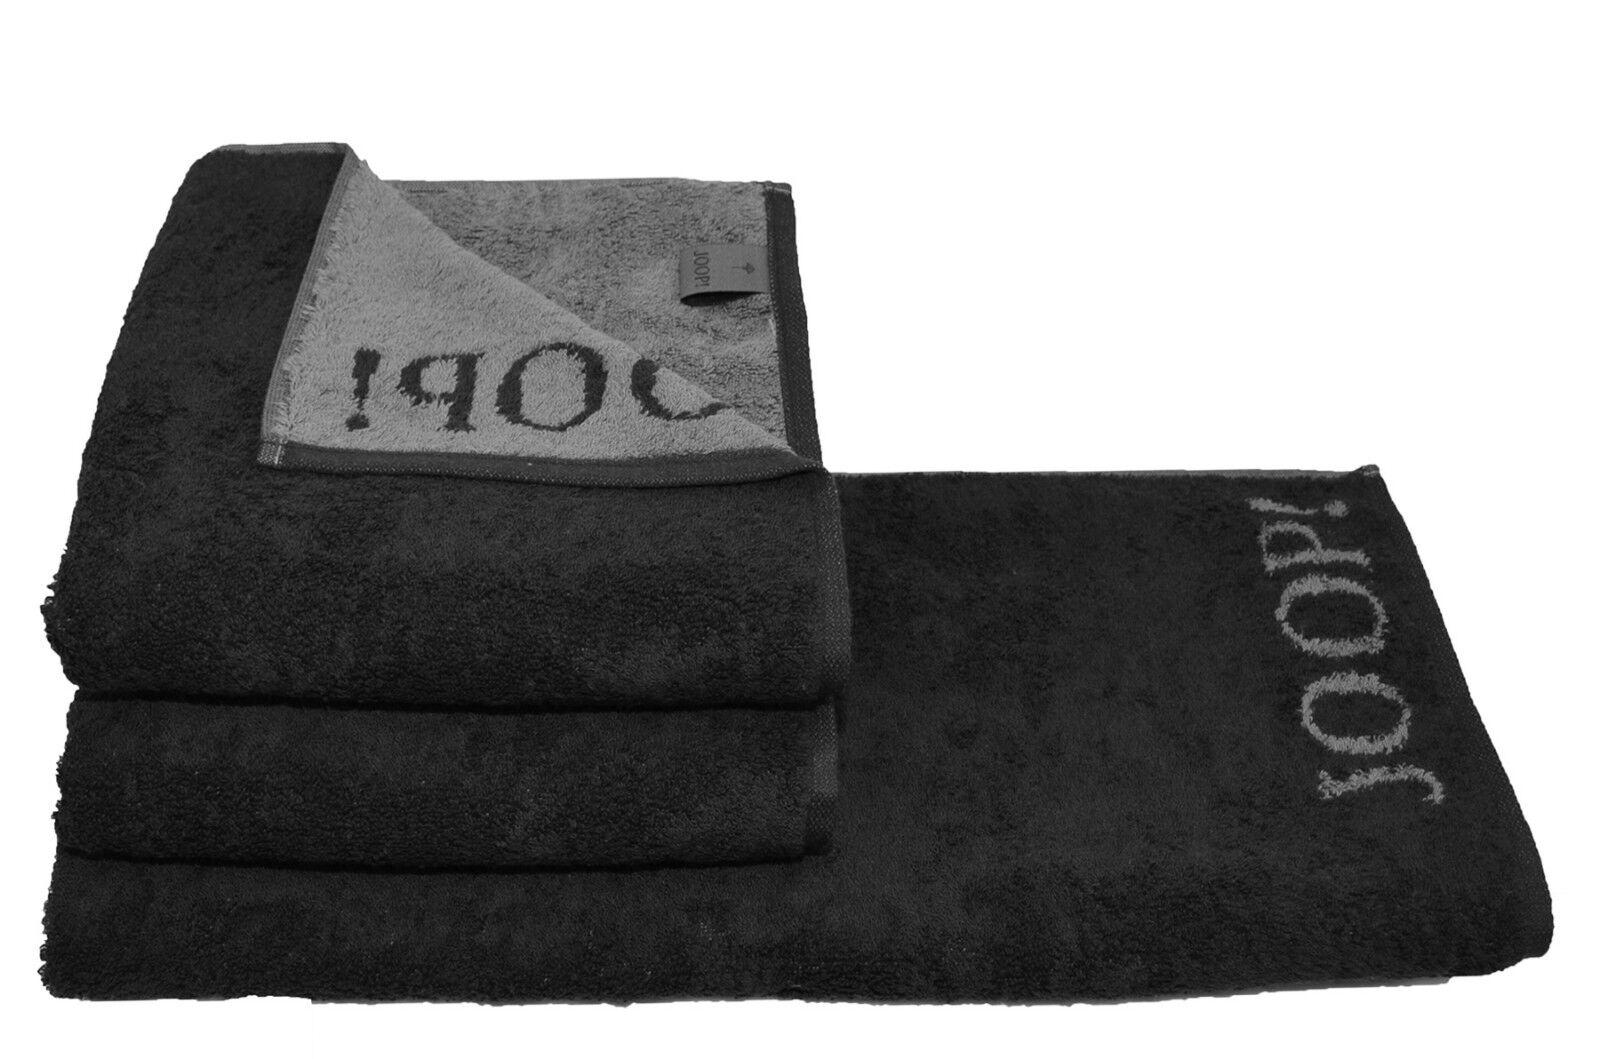 JOOP! 4x Handtuch Steakbesteck geschenkt + Serie 1600 schwarz Handtücher kaufen